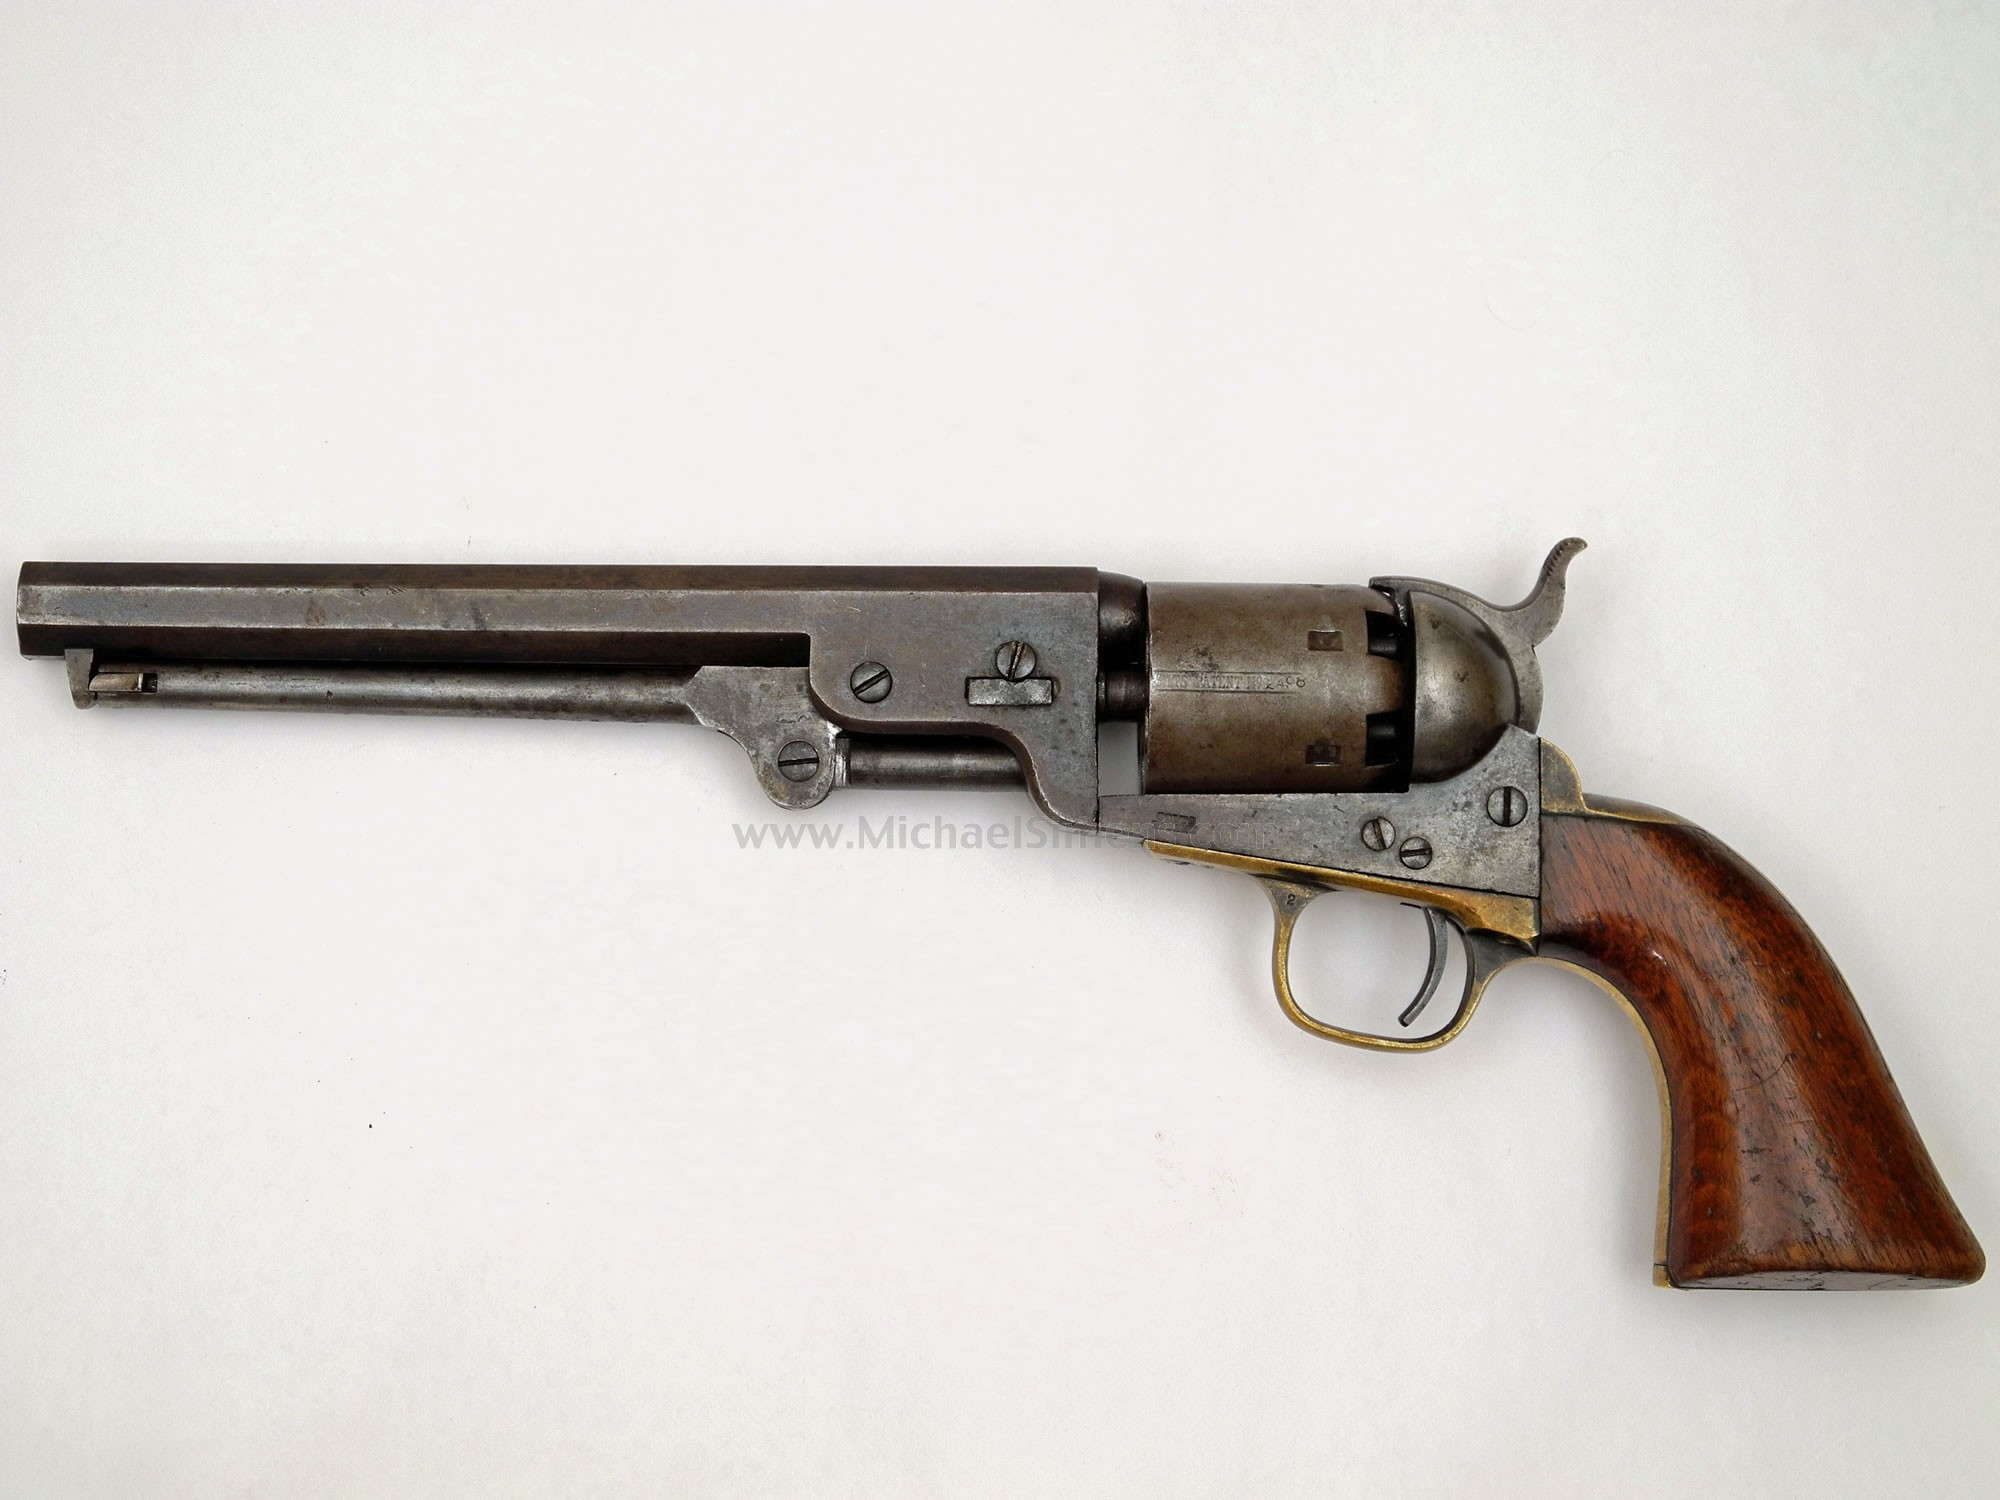 COLT NAVY REVOLVER OF 1851